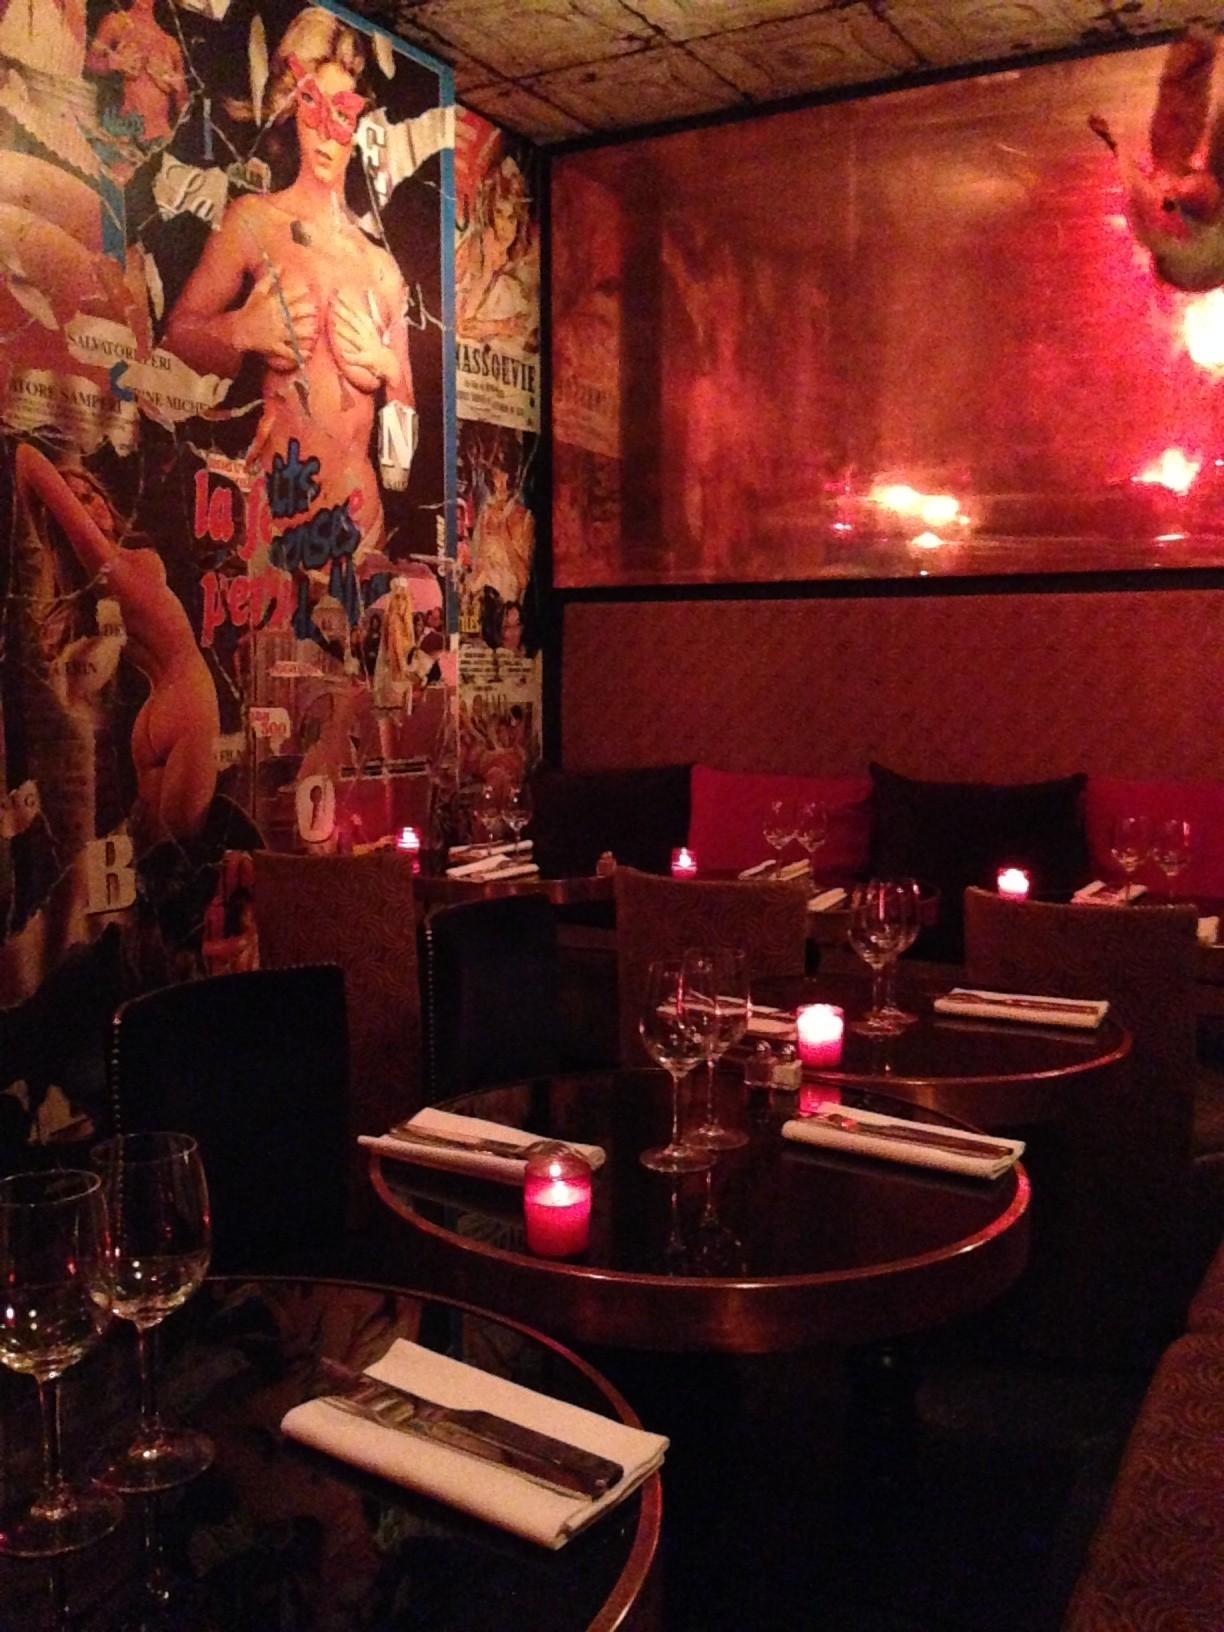 Le fourbi, cocktail tapas bar in Paris